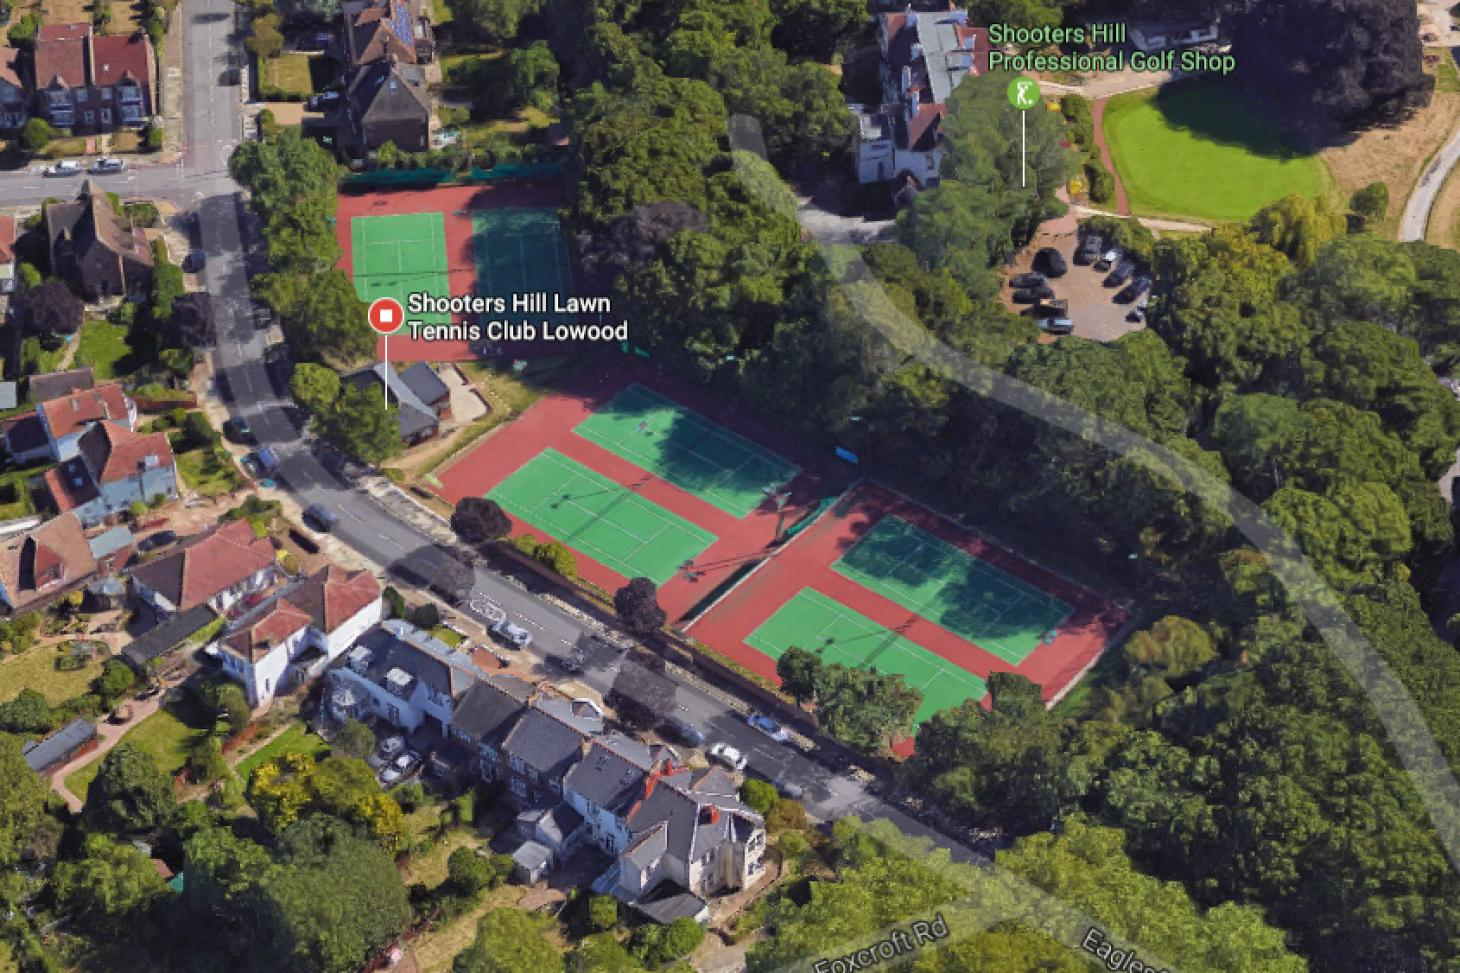 Shooters Hill Lawn Tennis Club Outdoor | Hard (macadam) tennis court